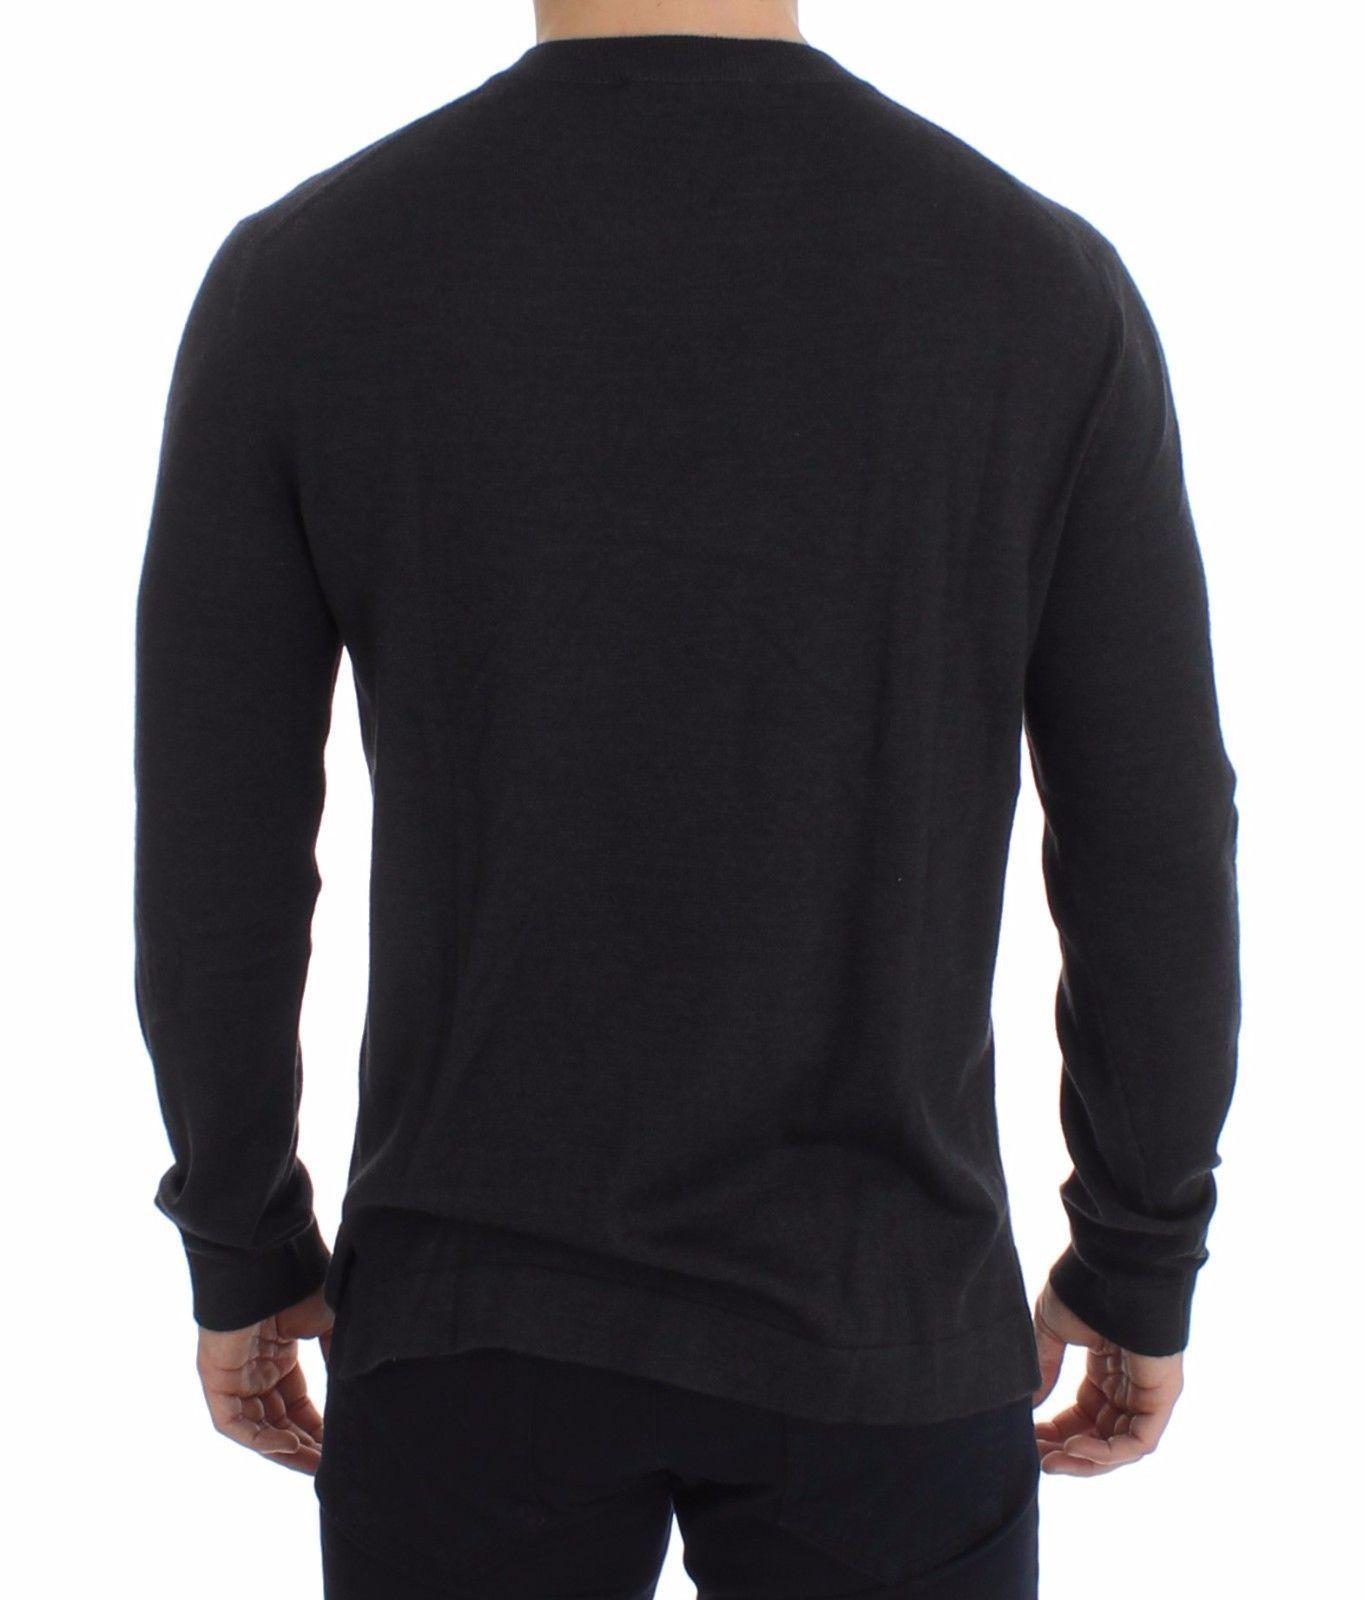 Dolce & Gabbana Gray Silk Cashmere V-neck Sweater Pullover 14904